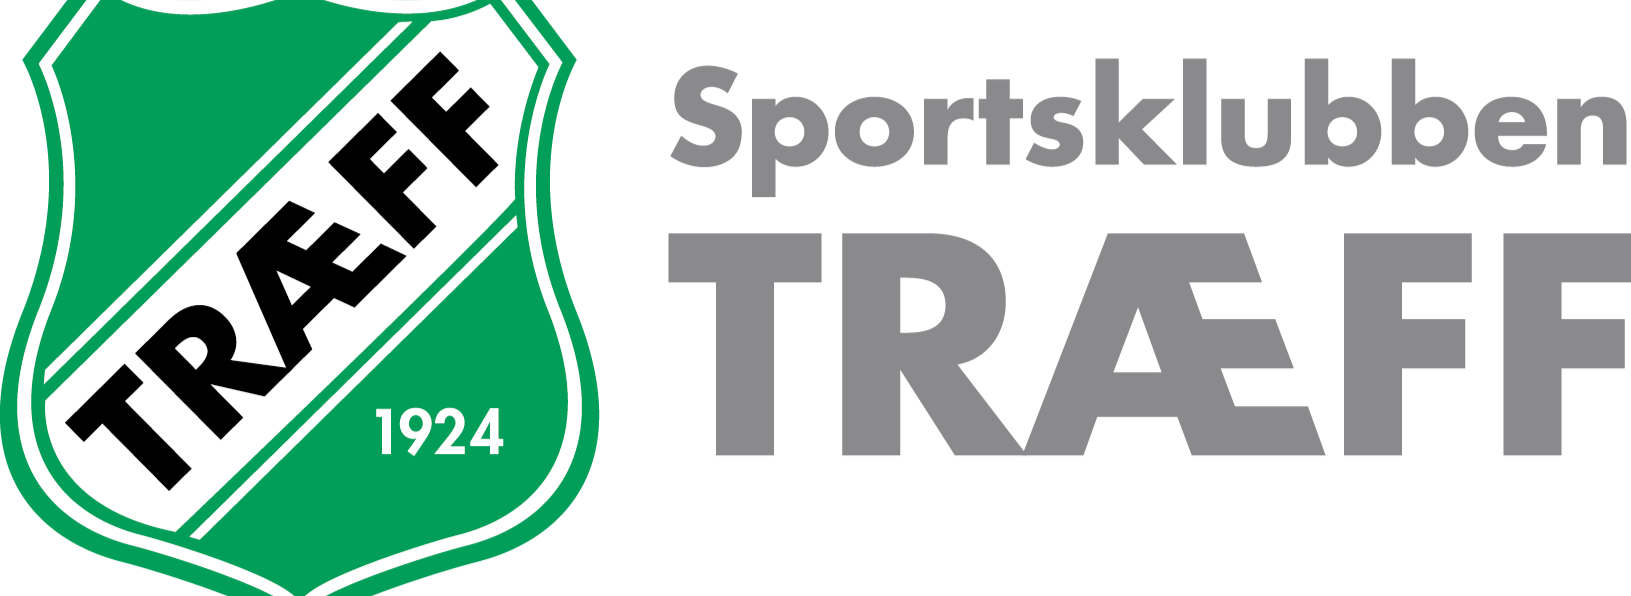 Headerbilde for Digitalt Årsmøte Sportsklubben Træff